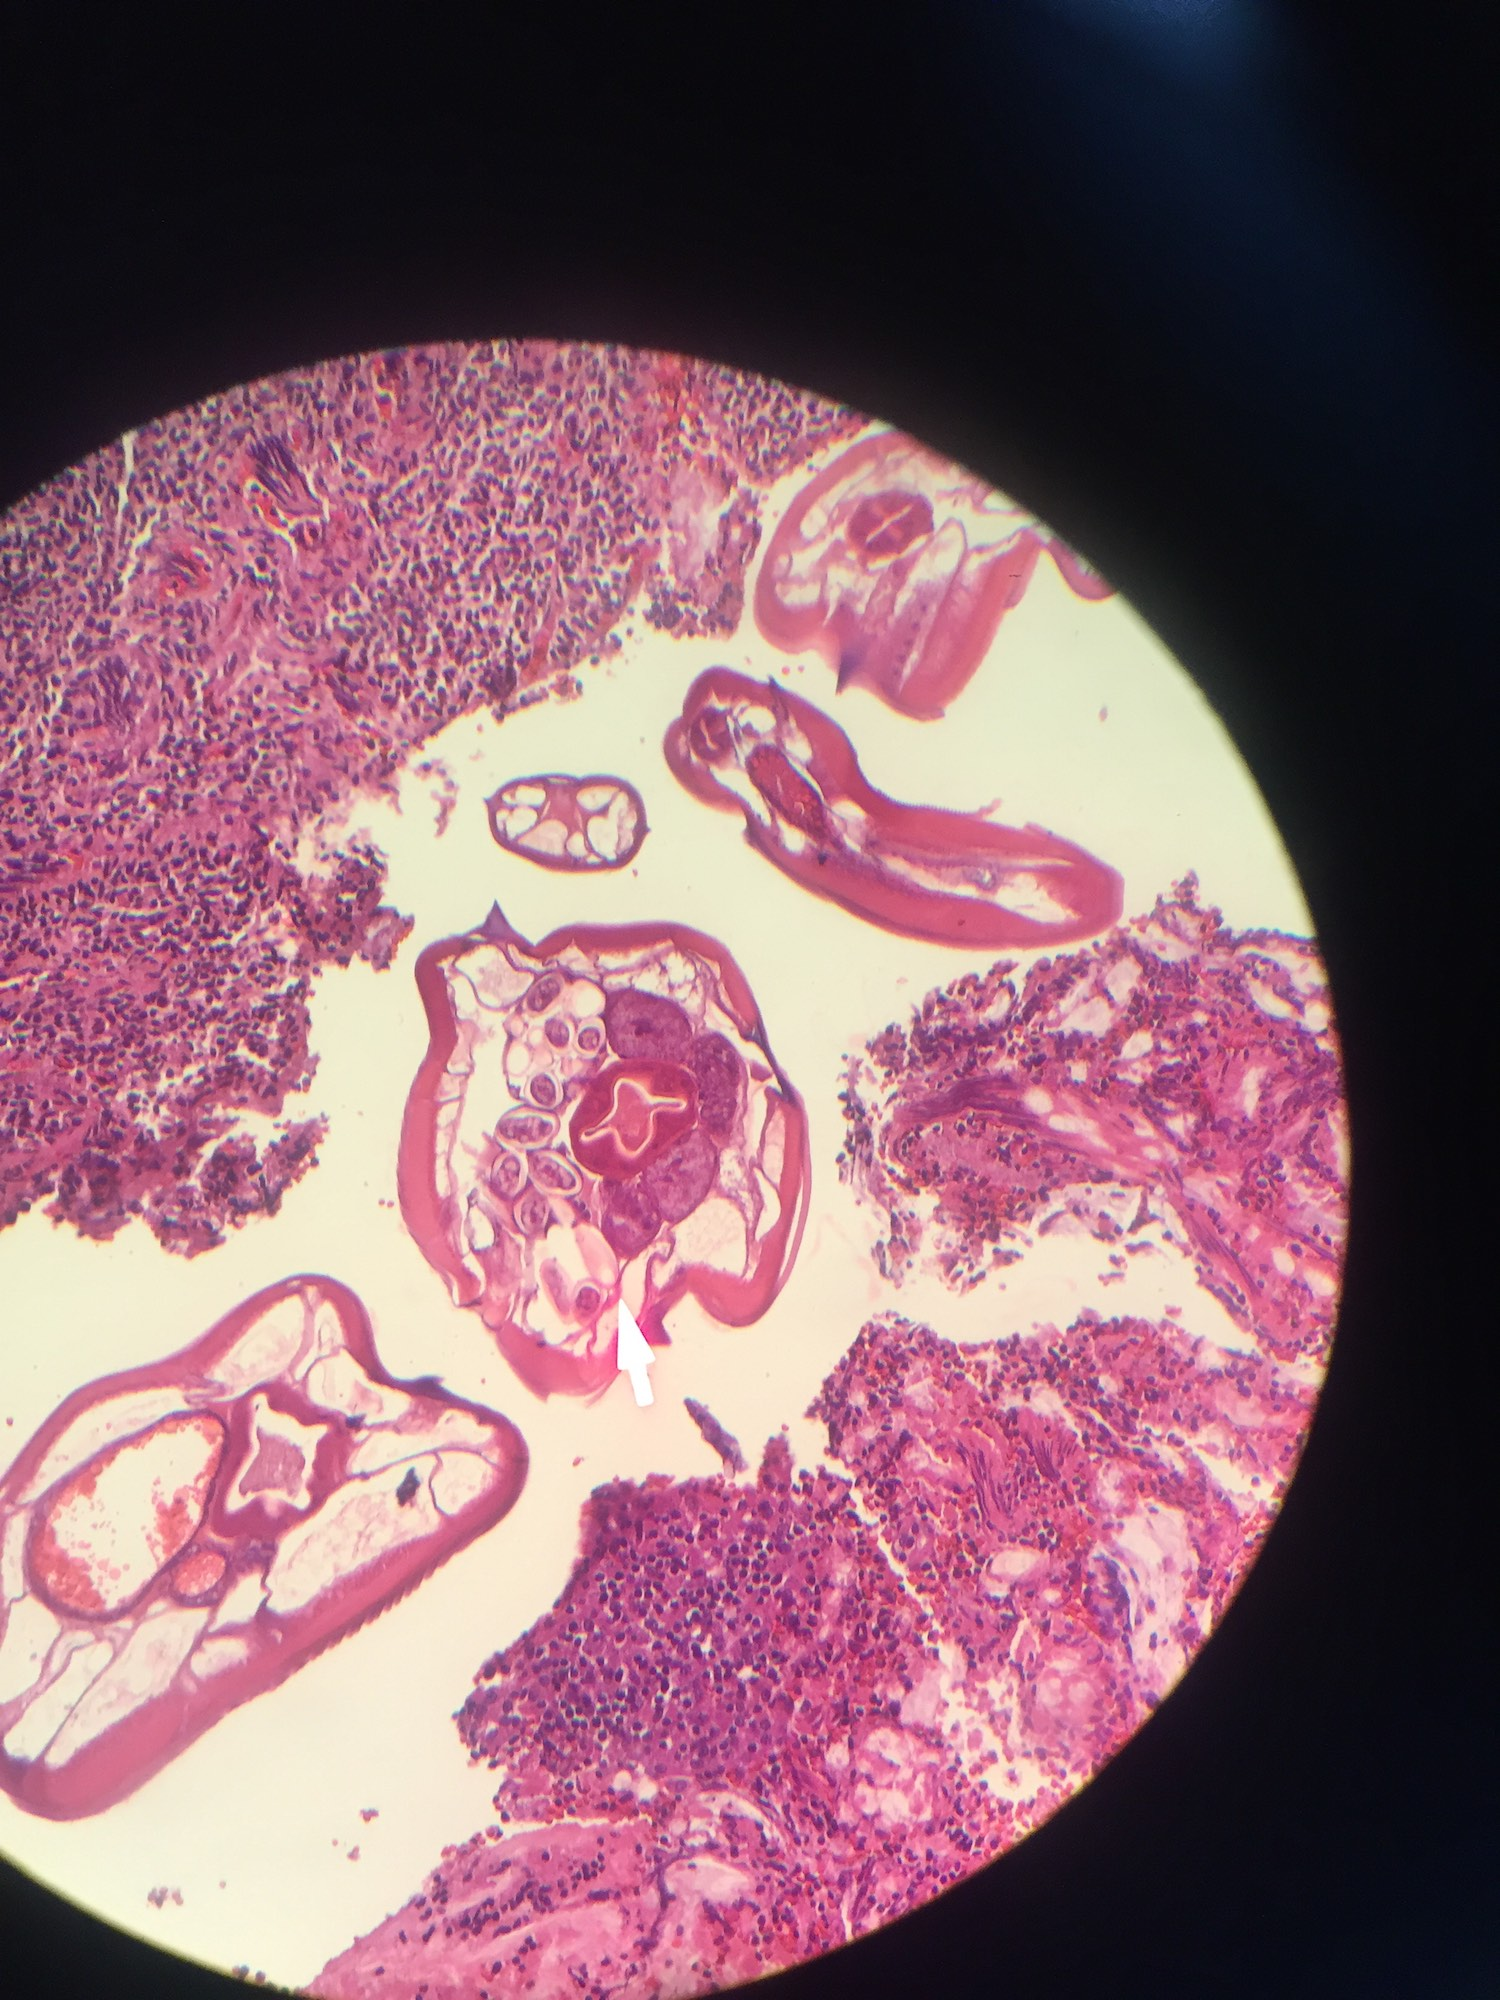 Enterobius vermicularis yumurtas,